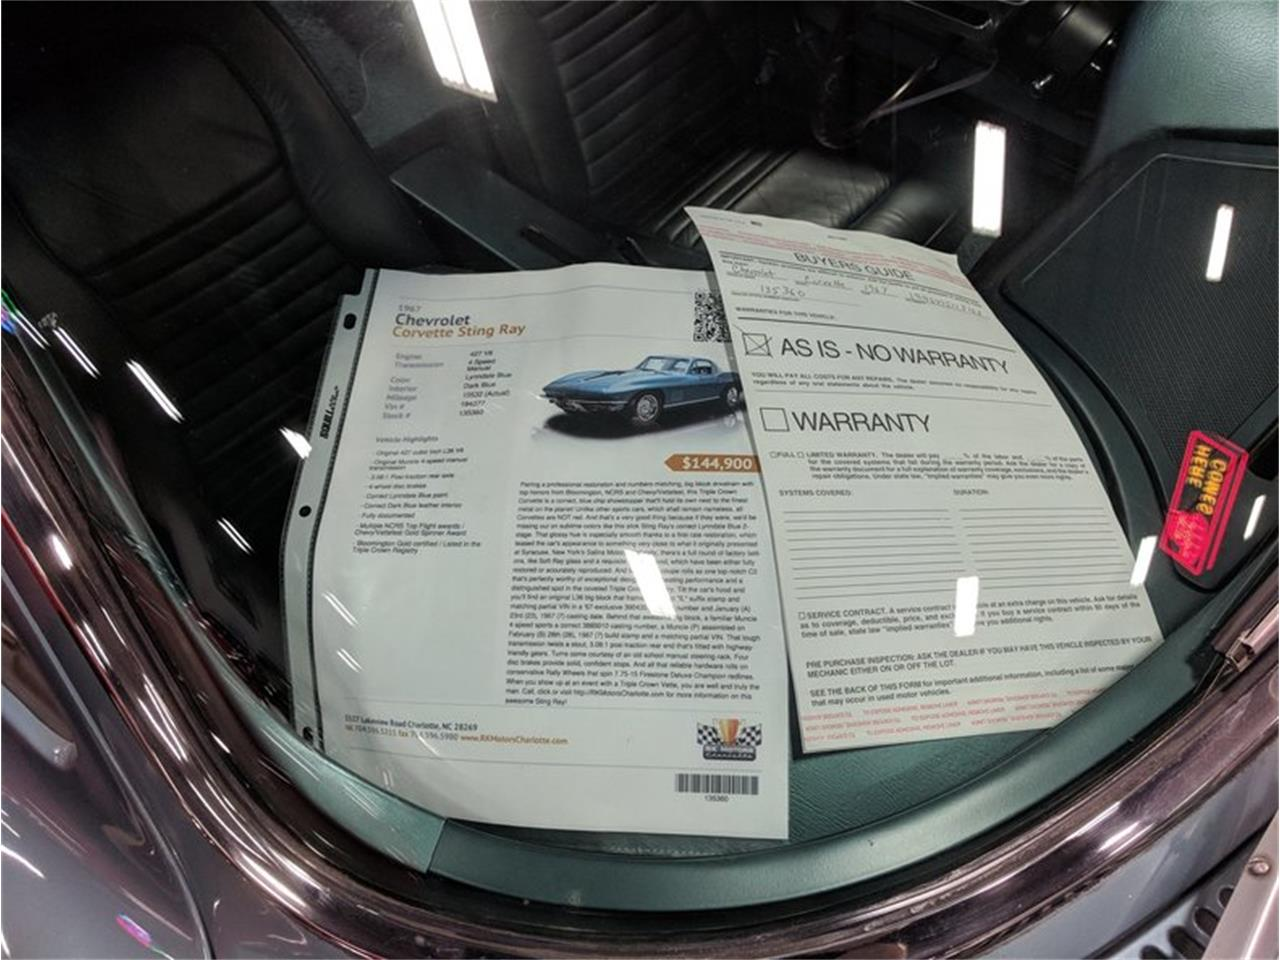 Large Picture of '67 Corvette located in North Carolina - $129,900.00 - MESF